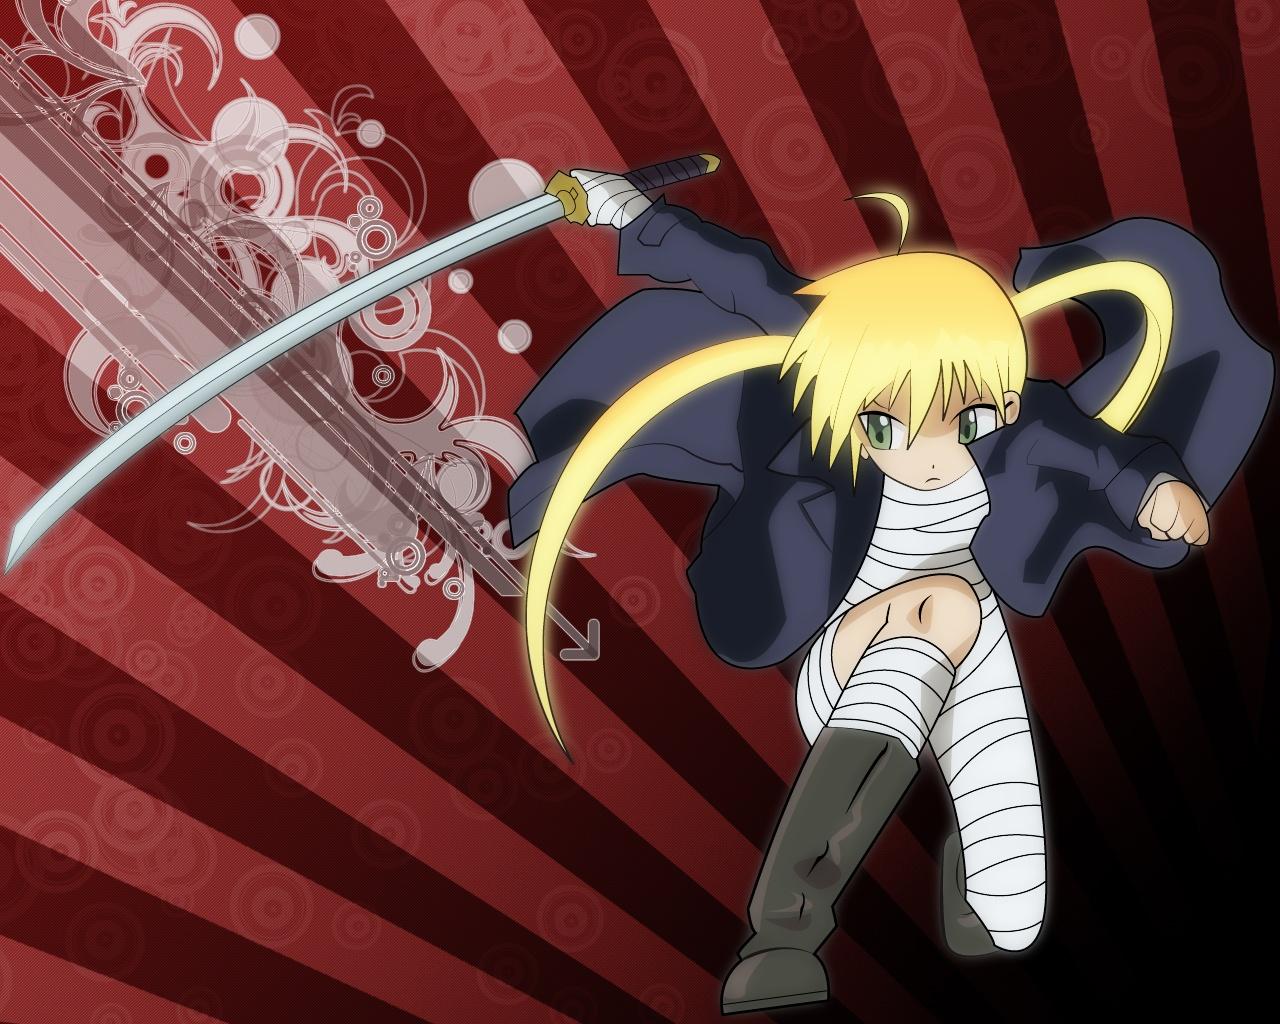 bandage hayate_no_gotoku katana loli sanzenin_nagi sword weapon